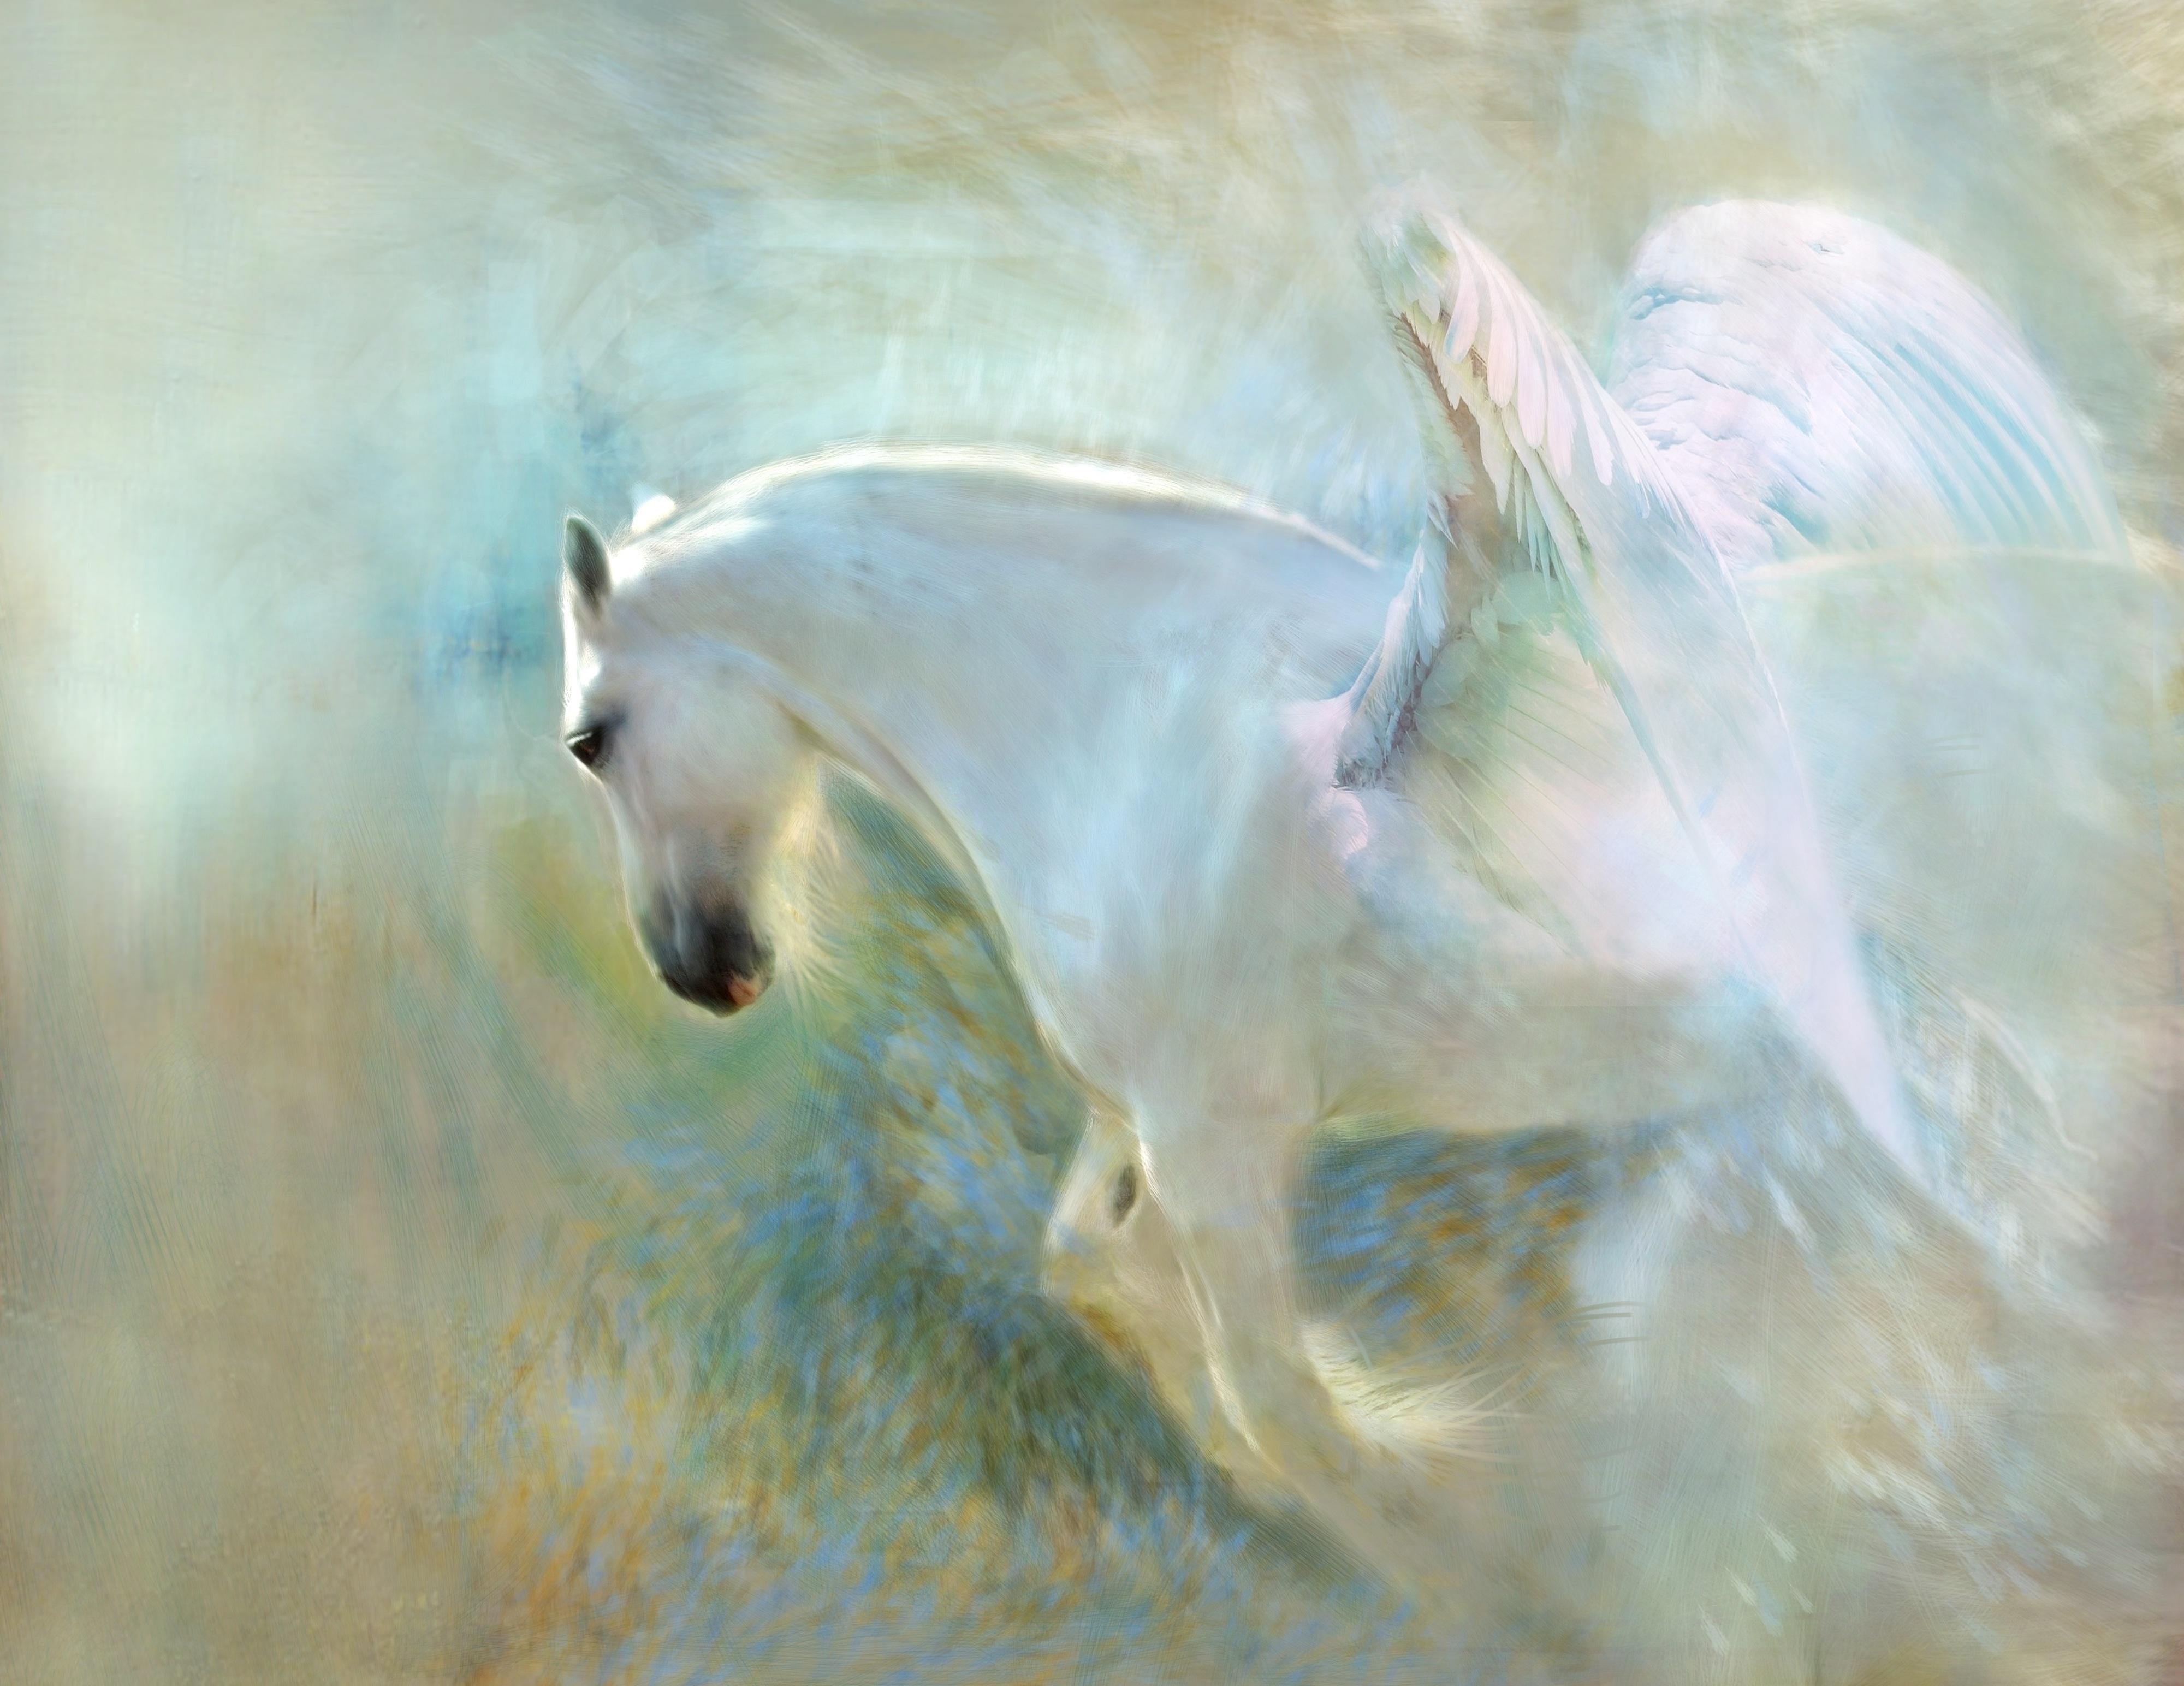 White Horse With Wings 4k Ultra Fondo De Pantalla Hd Fondo De Escritorio 4000x3088 Id 888977 Wallpaper Abyss